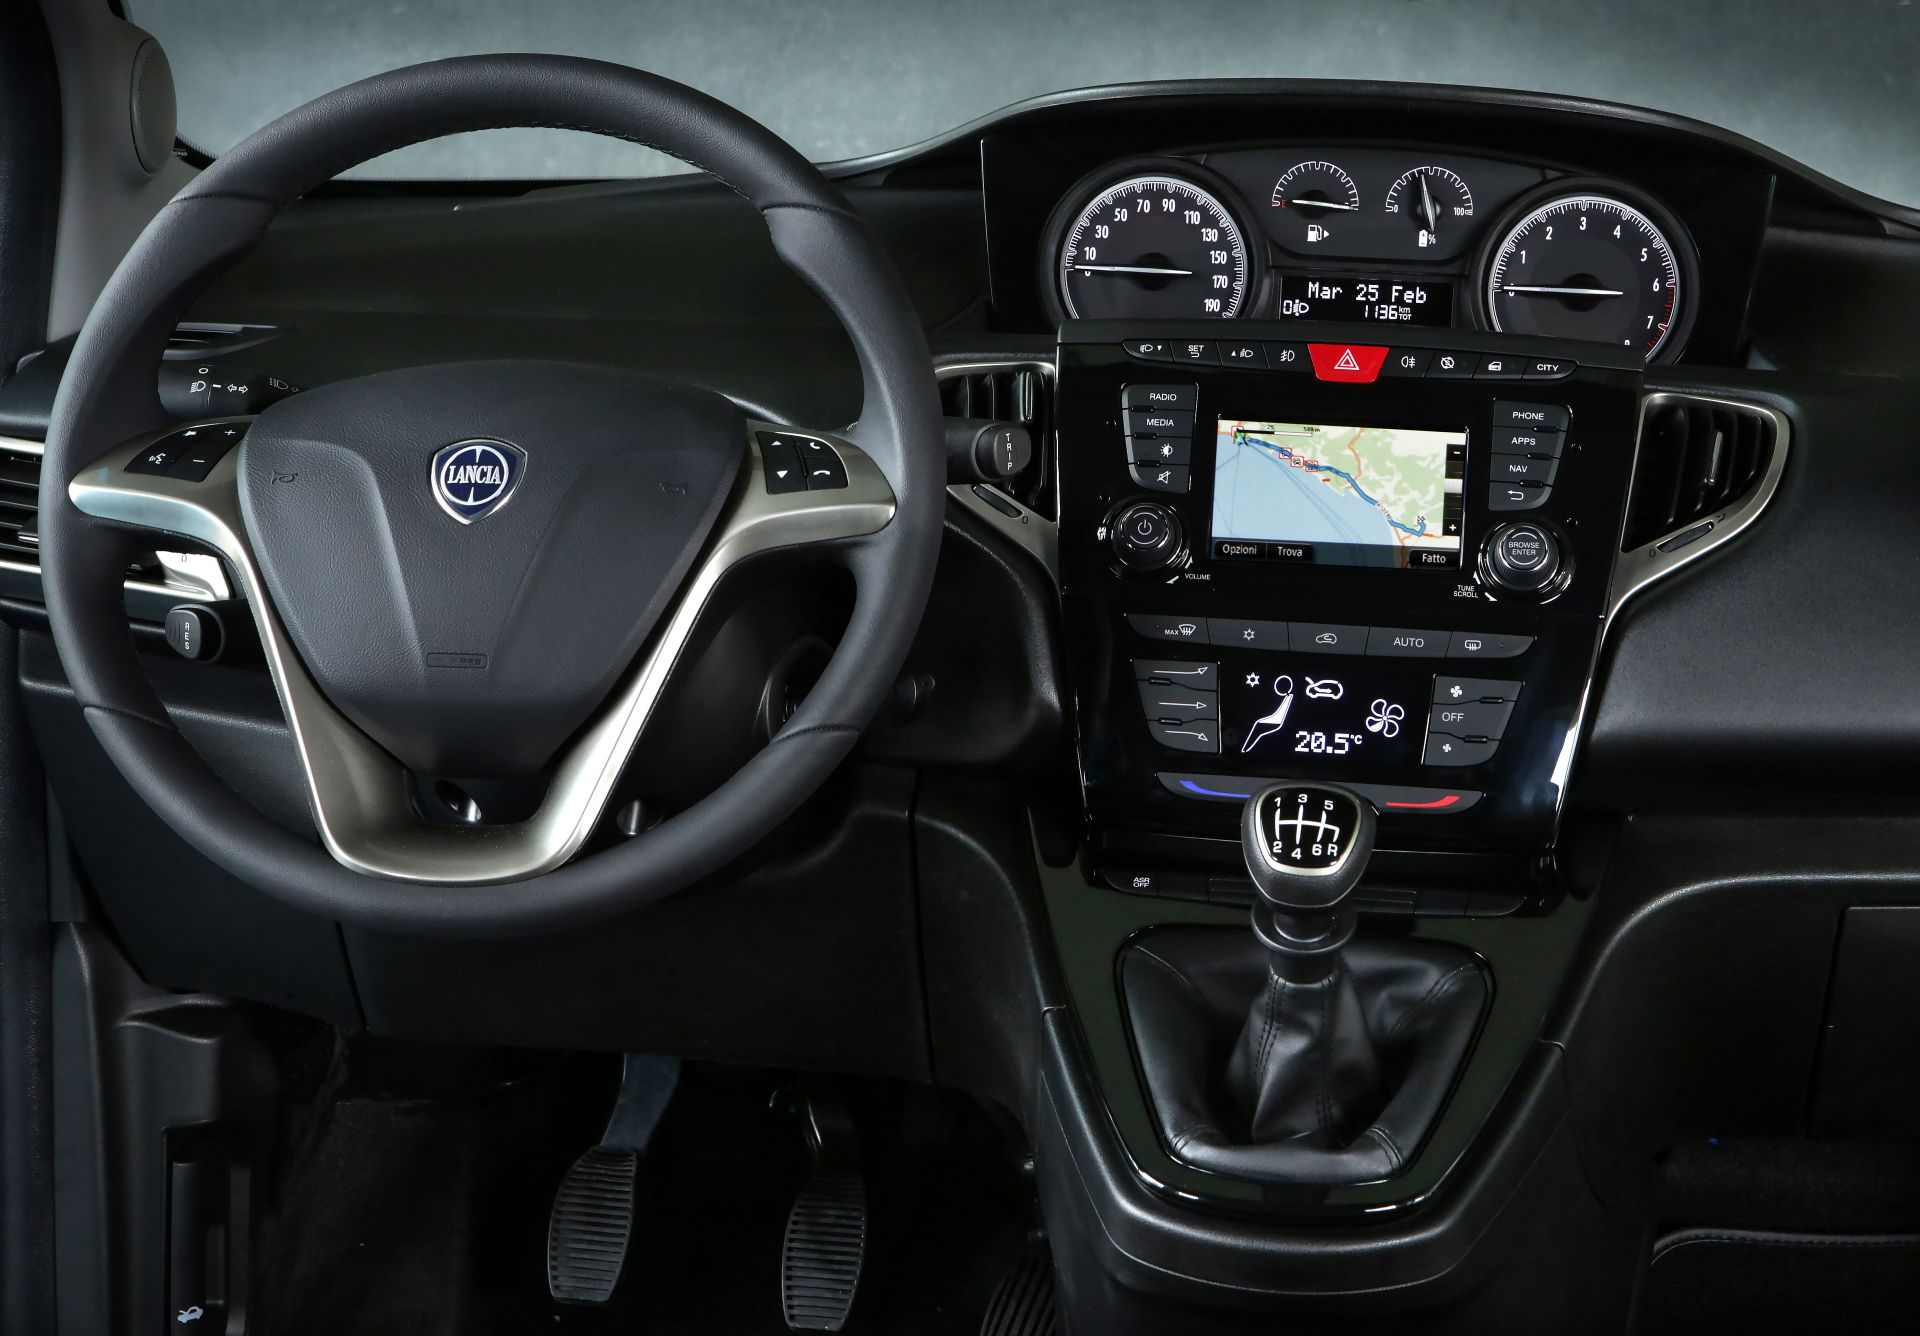 Lancia_Ypsilon_Hybrid_EcoChic_0023